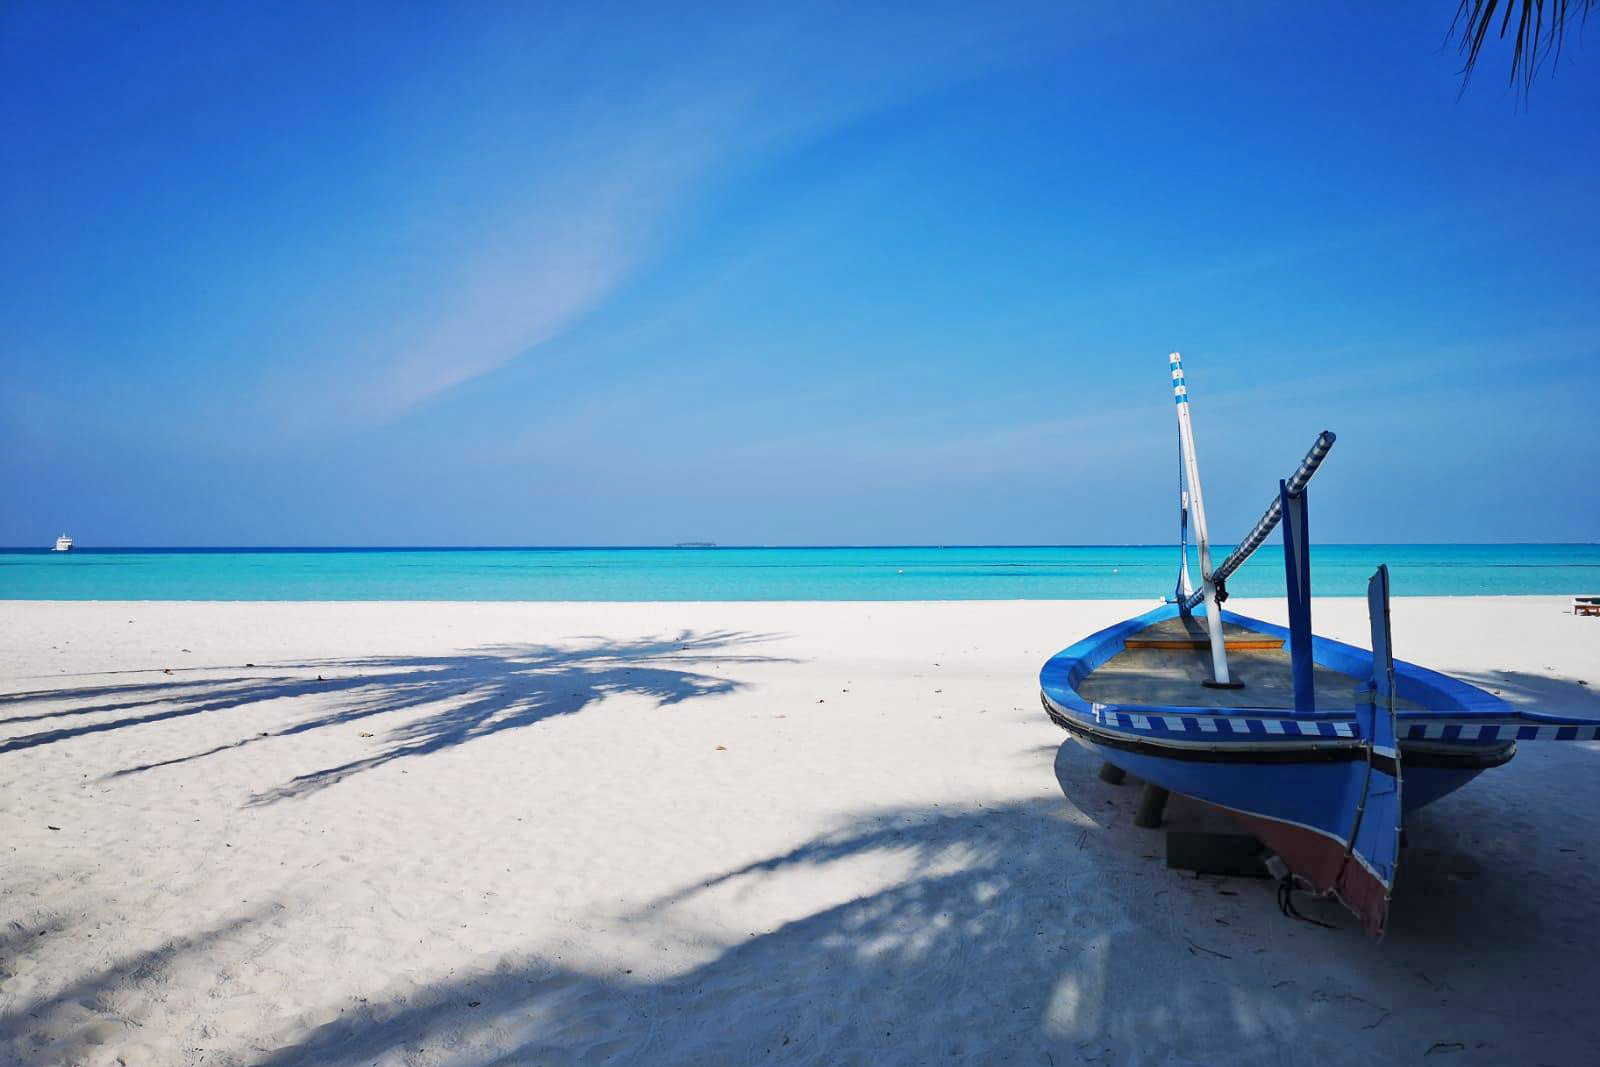 Sejur plaja Maldive, 8 zile - august 2021